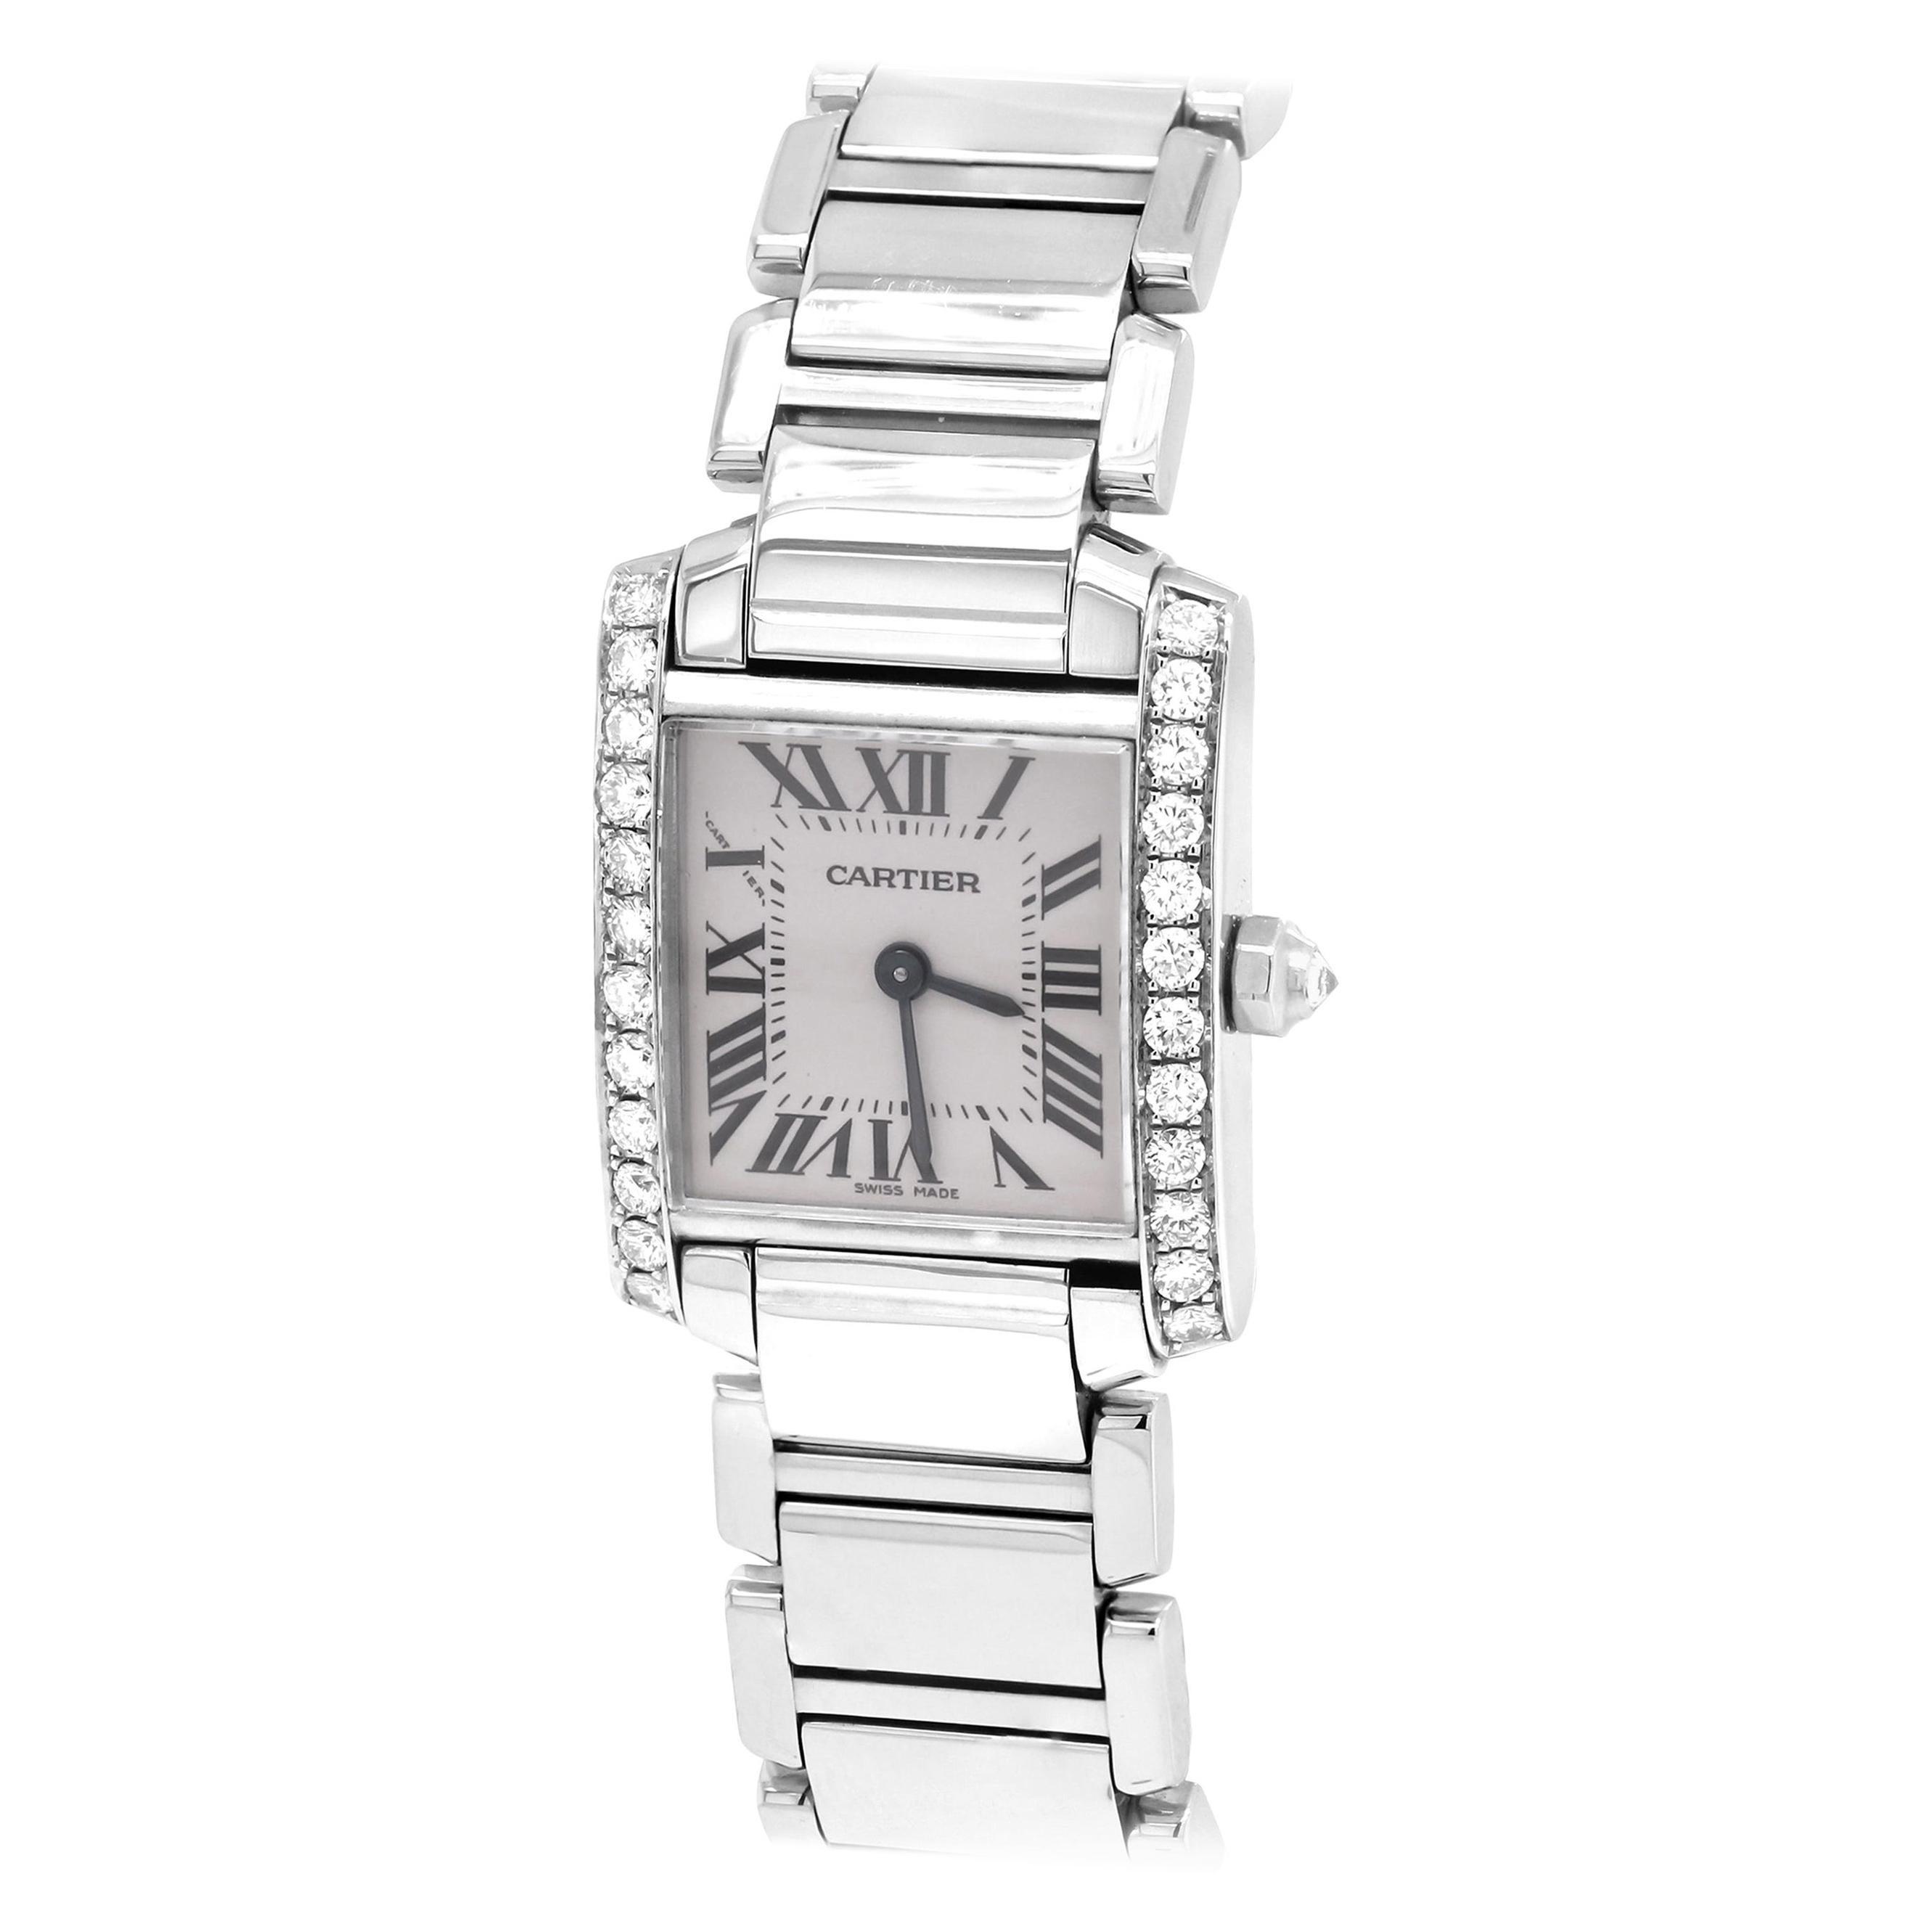 Cartier Tank Francaise Stainless Steel White Diamond Bezel Ladies Watch 2384